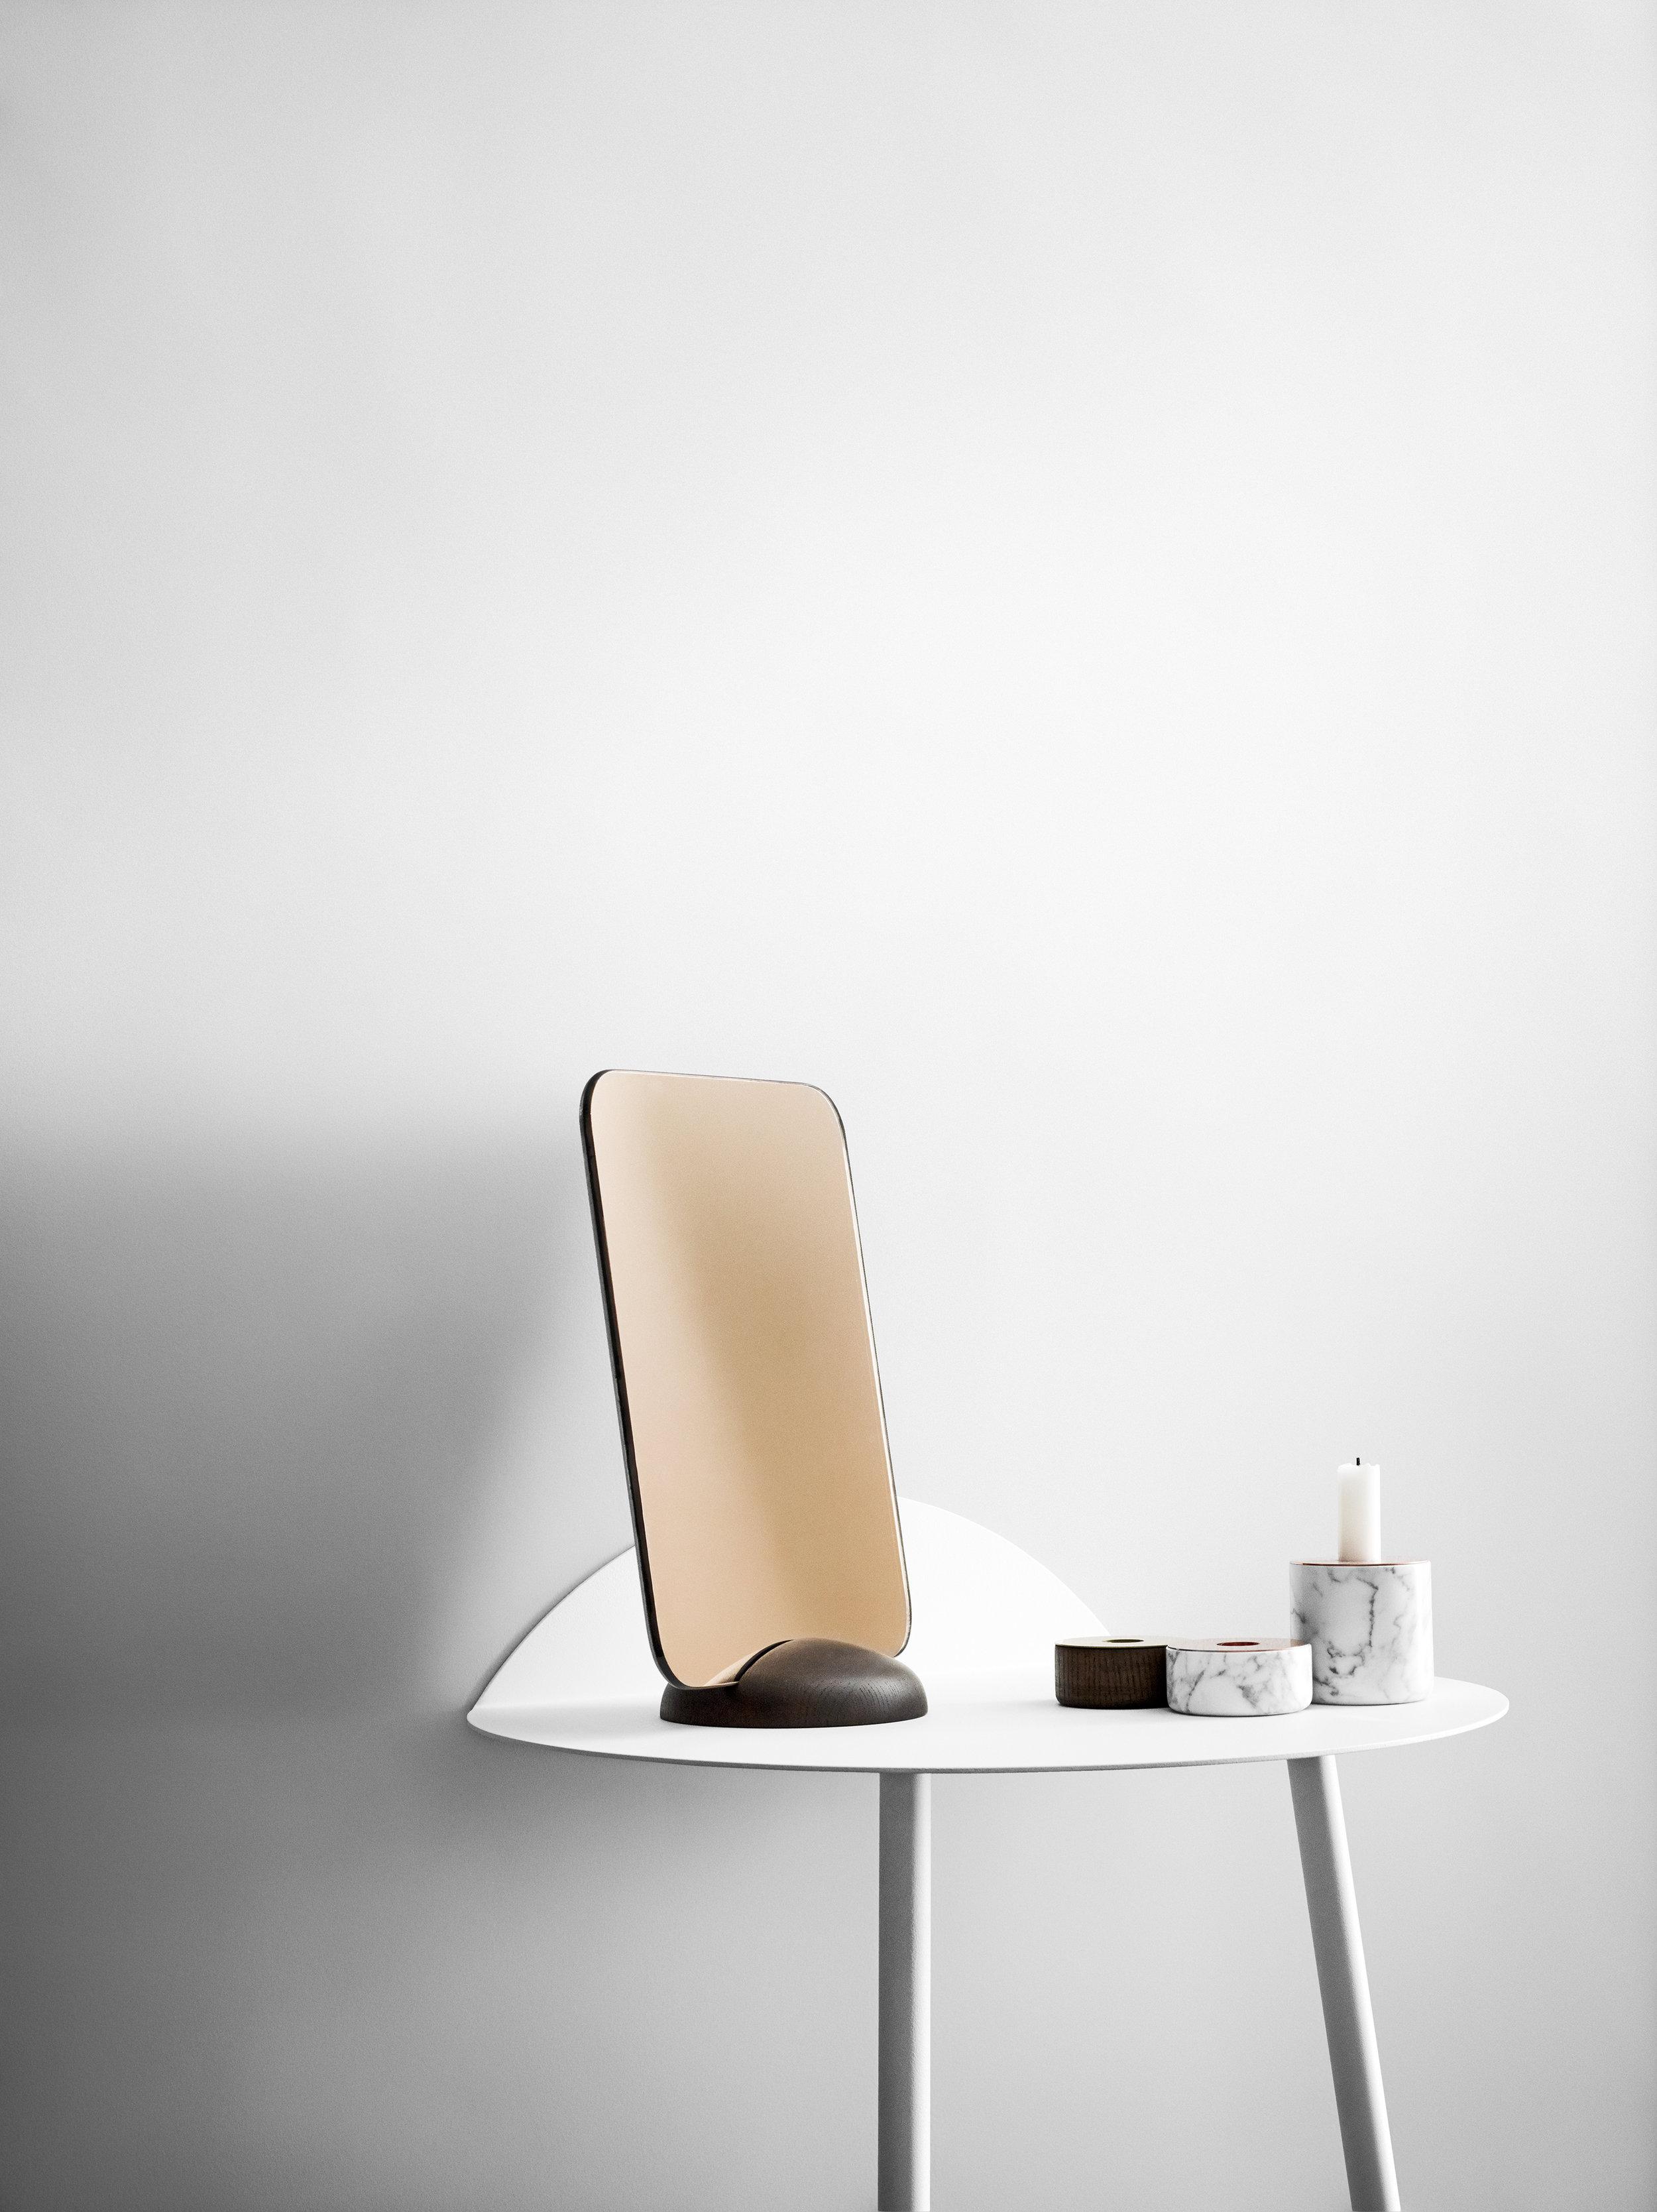 Chunk by Andreas Engesvik for MENU